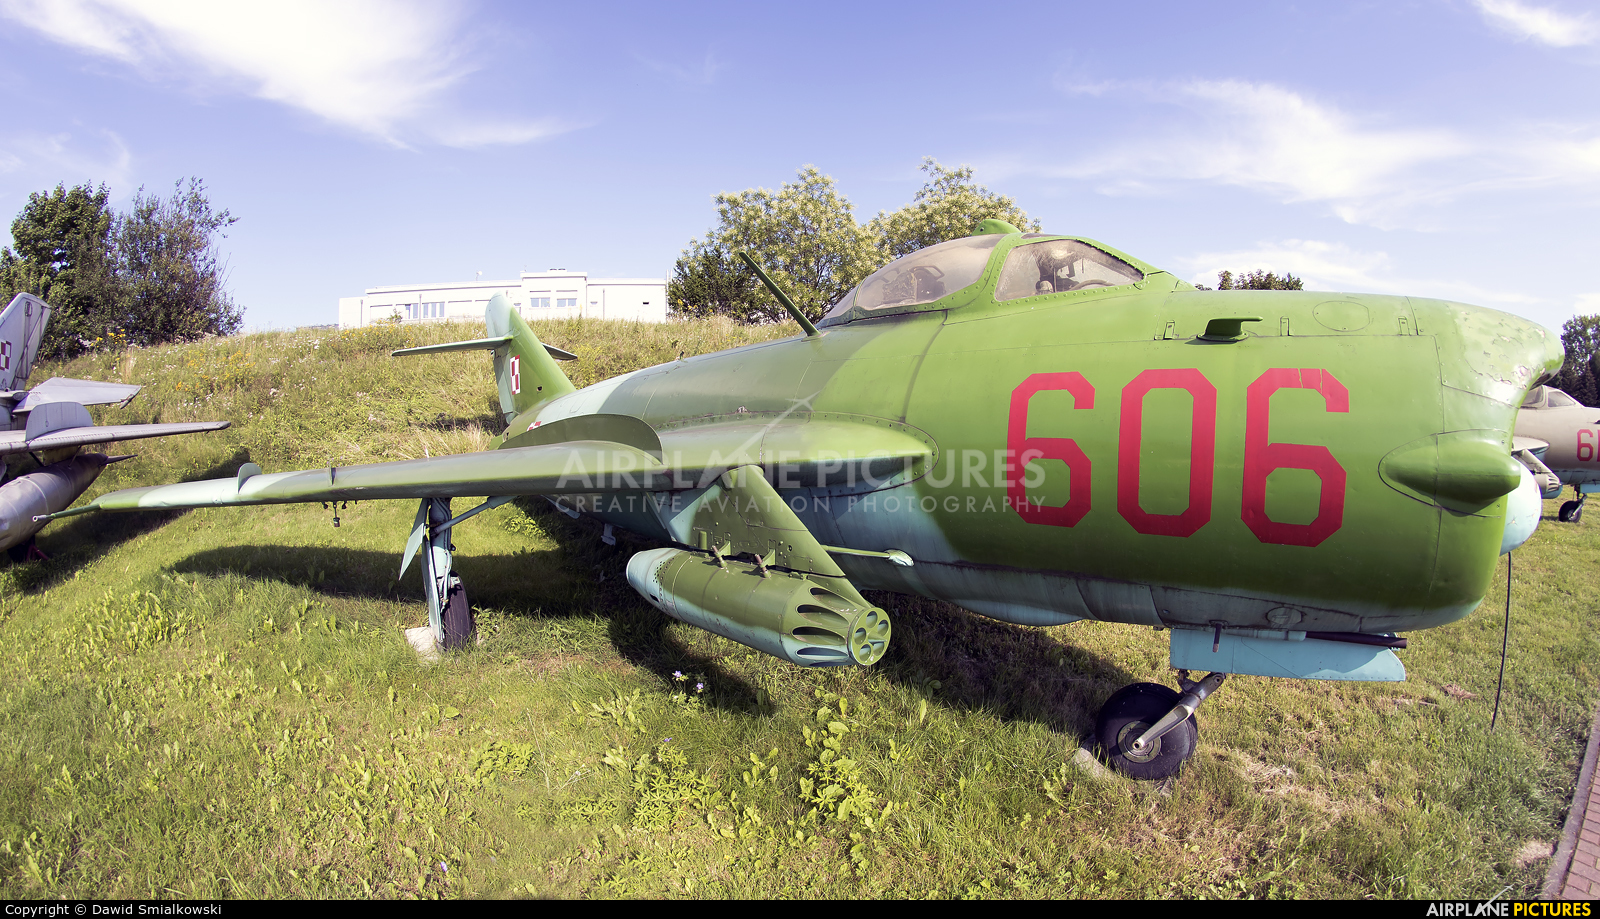 Poland - Air Force 606 aircraft at Kraków, Rakowice Czyżyny - Museum of Polish Aviation